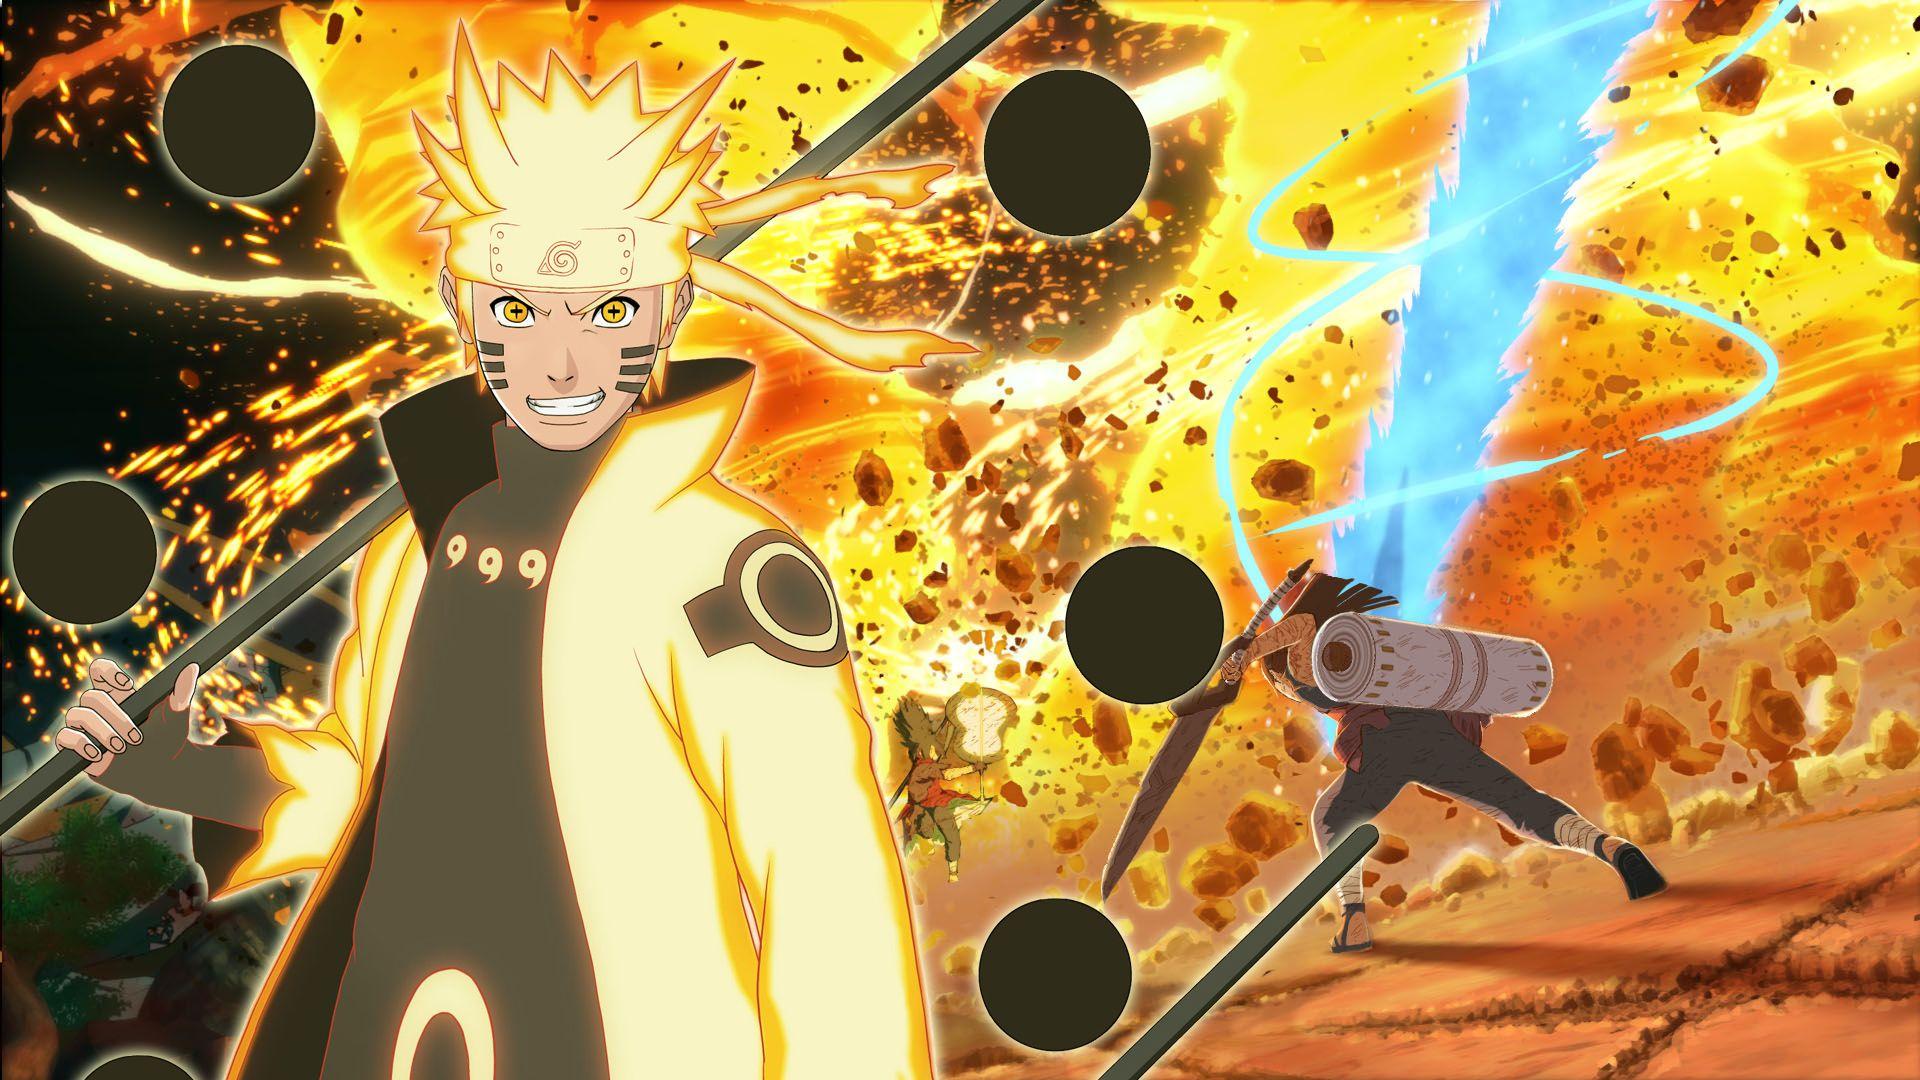 Naruto Shippudden Wallpapers Group 1024 768 Naruto Shippuden Backgrounds 50 Wallpapers Naruto Wallpaper Android Wallpaper Anime Wallpaper Naruto Shippuden